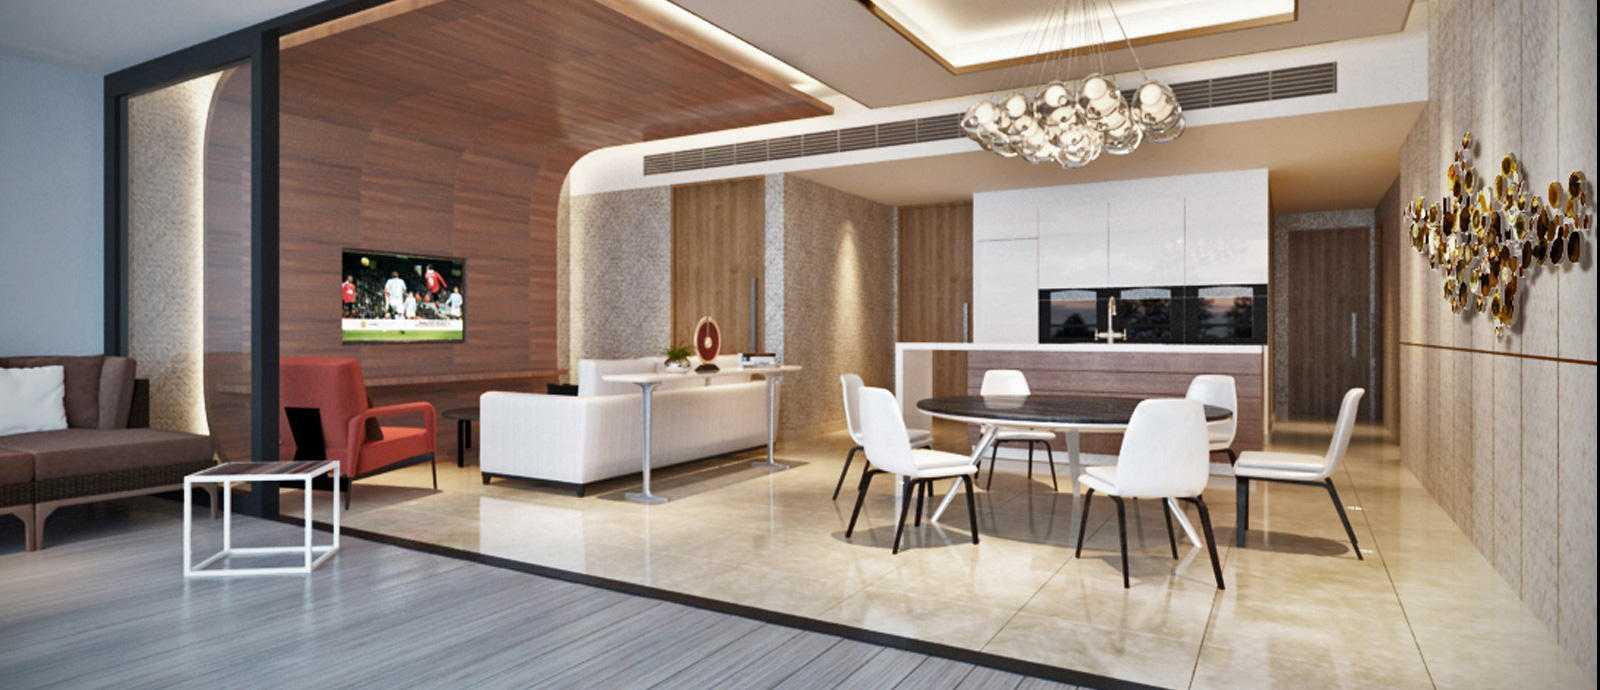 Best Interior Design Companies In Singapore Face Tag